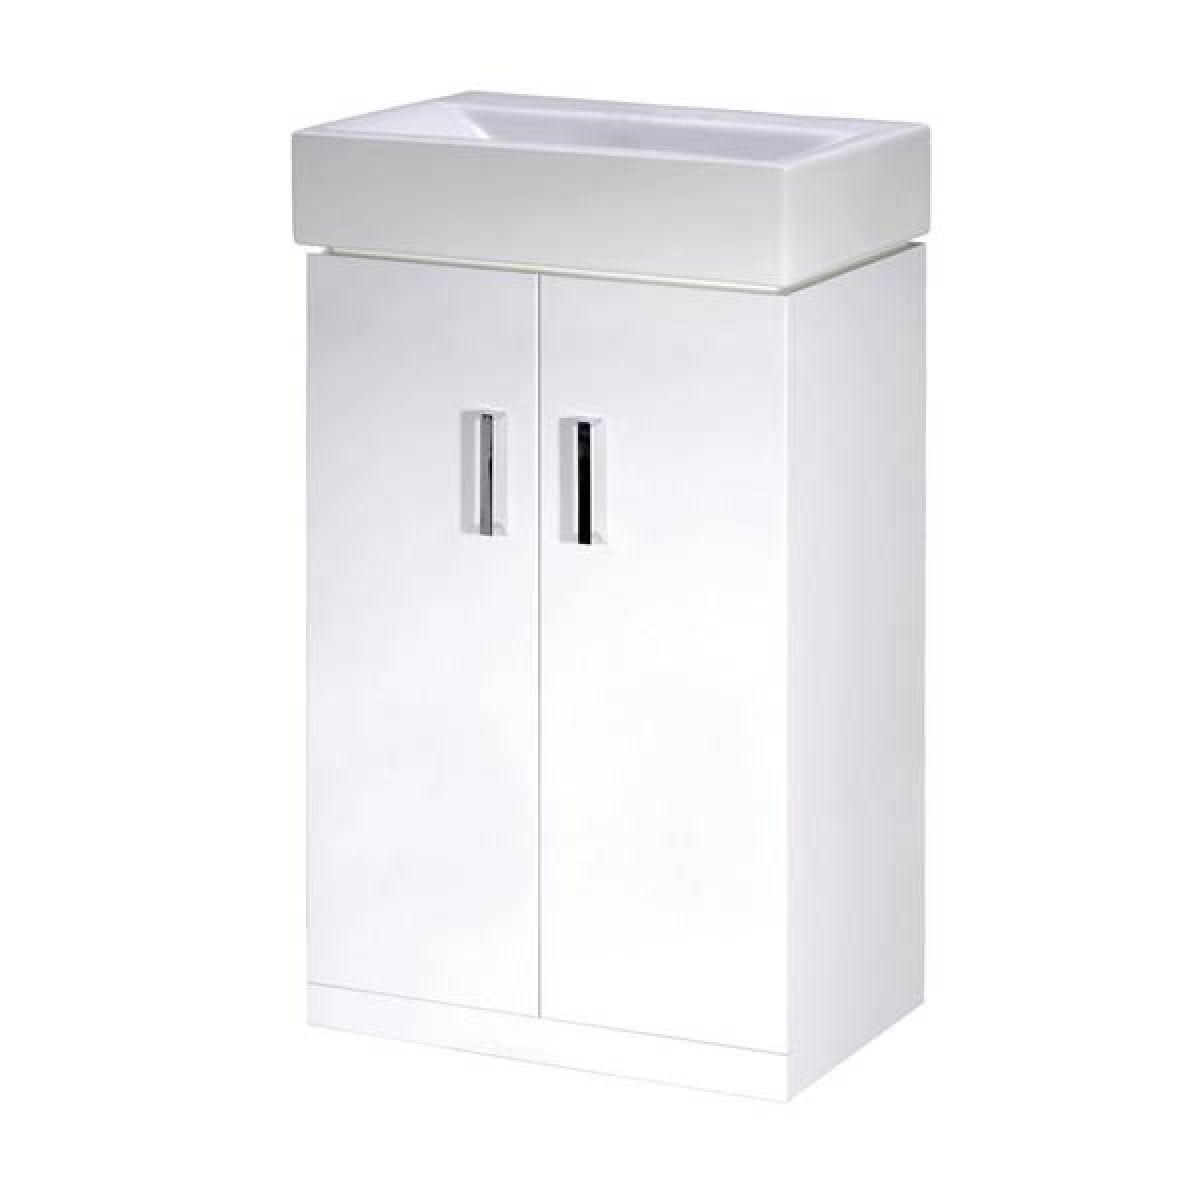 Premier Floor Standing Cabinet with Basin 450mm